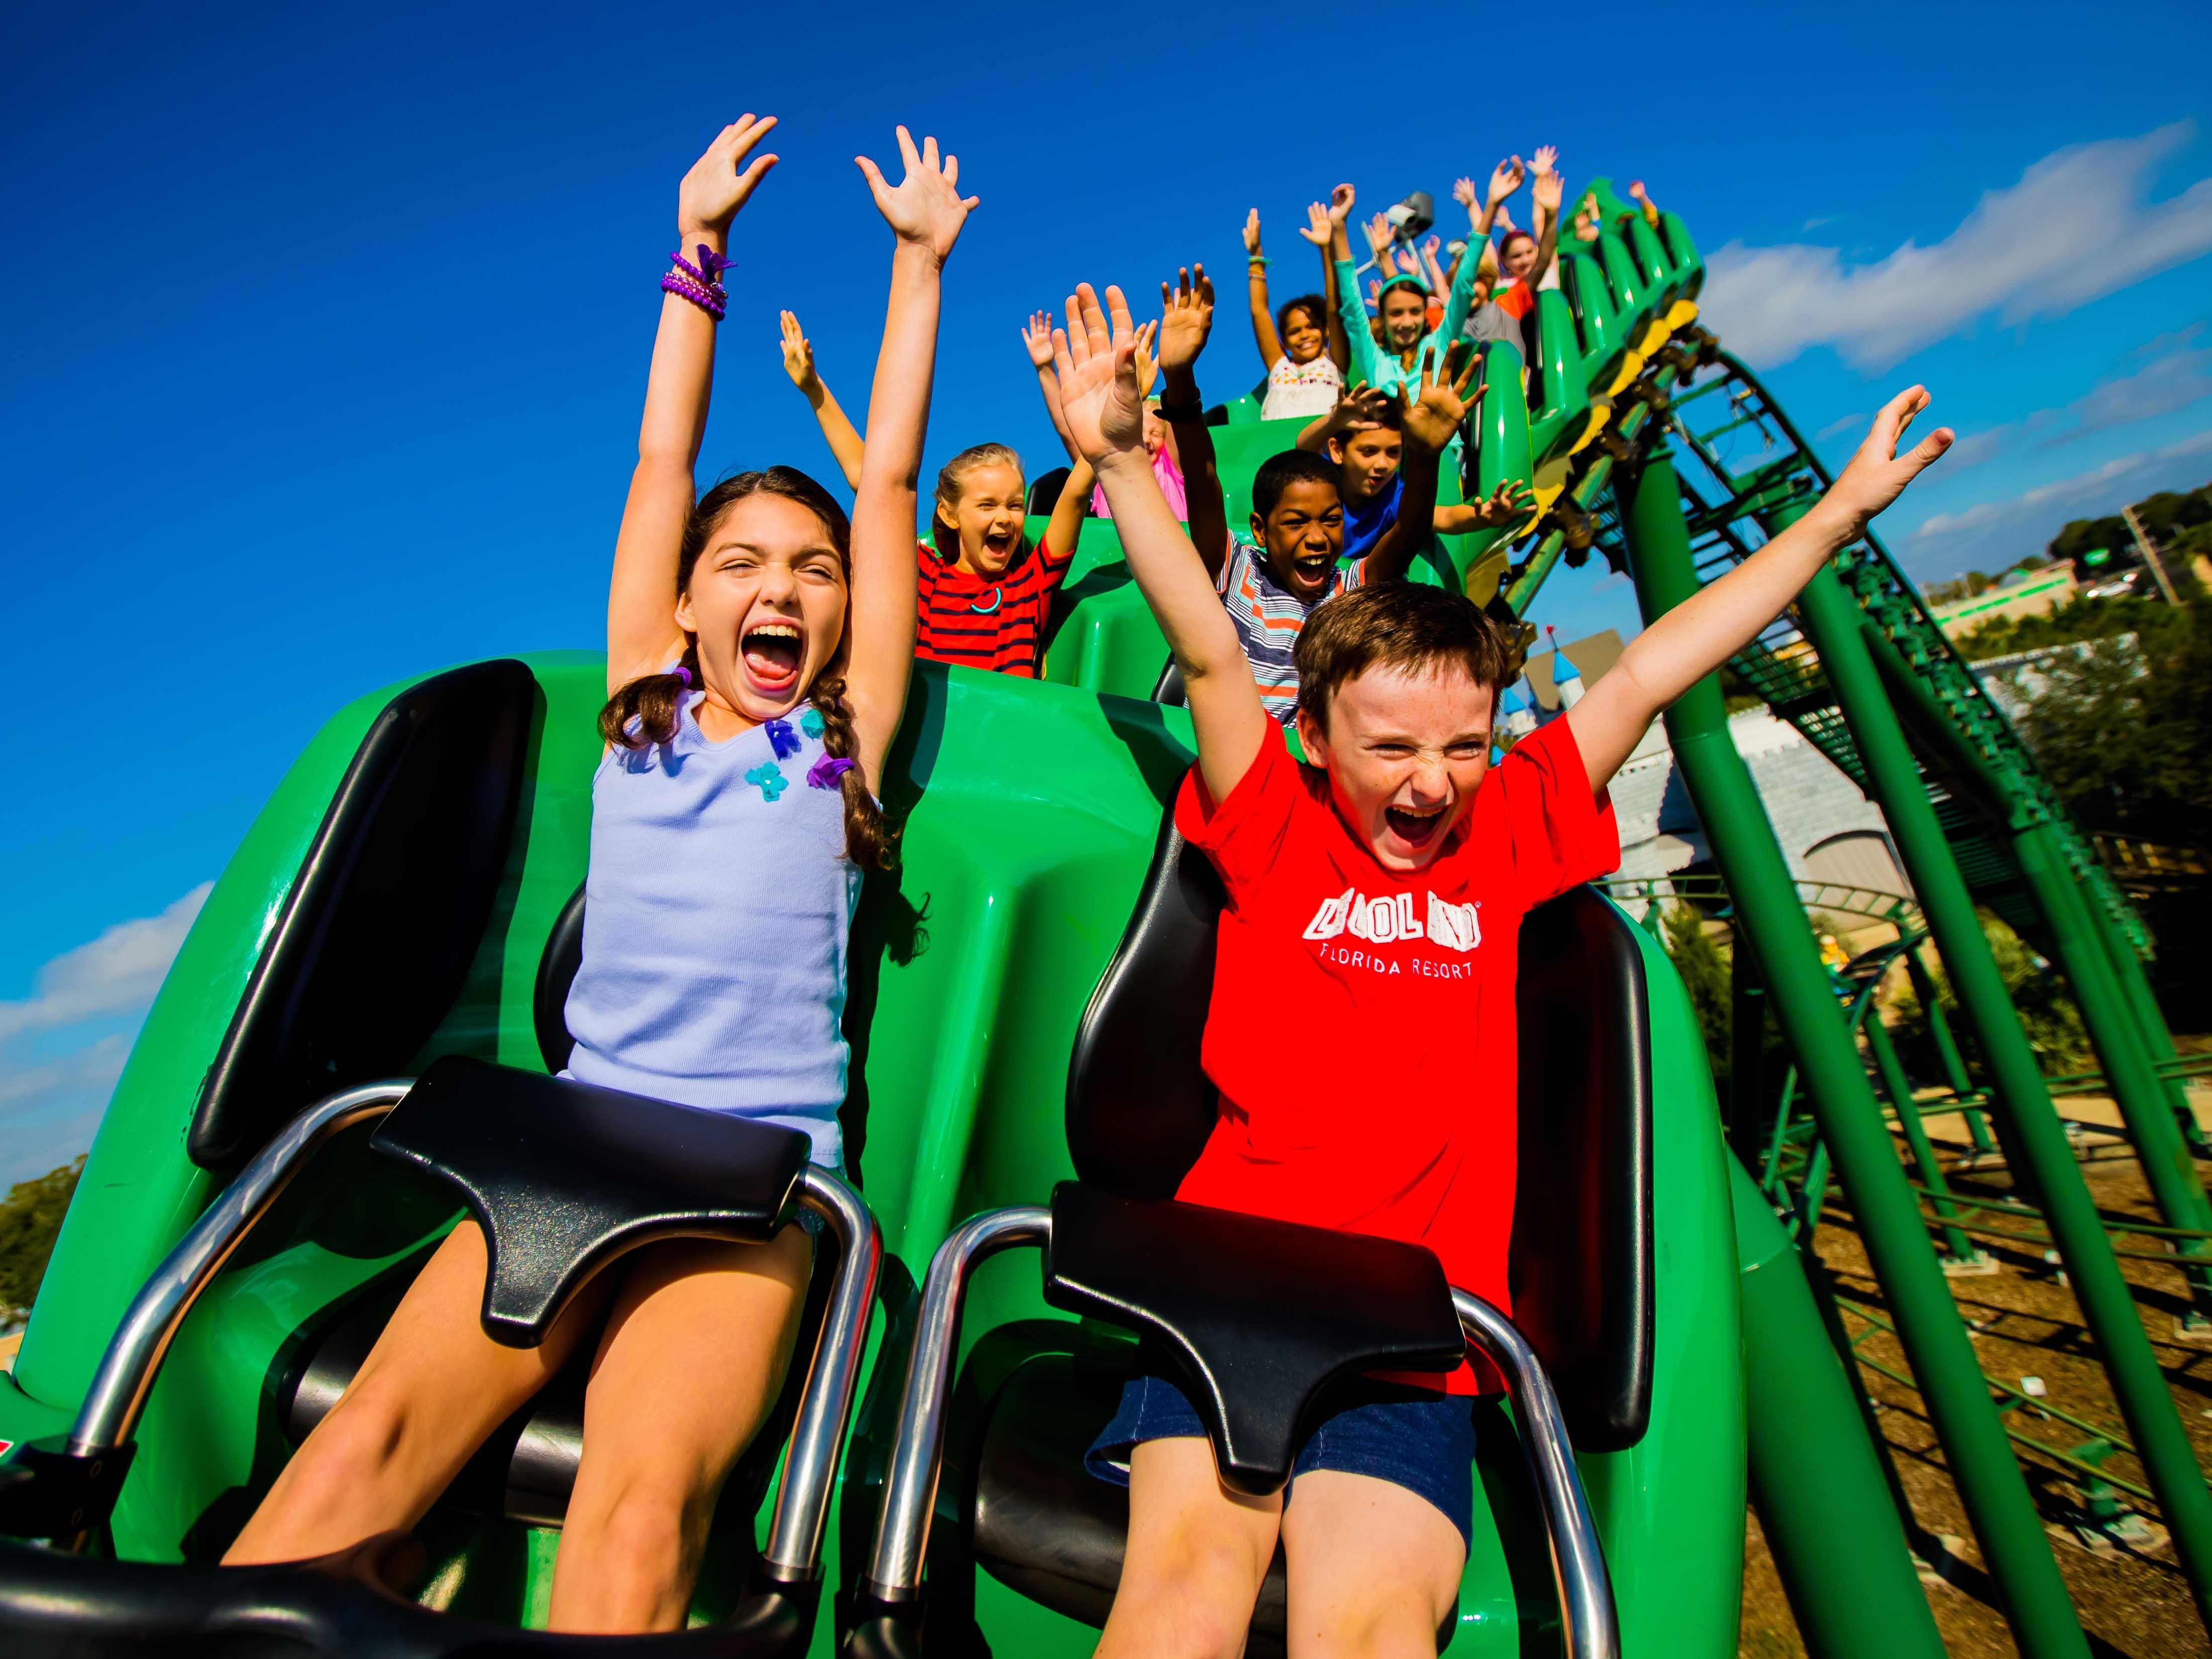 LEGOLAND® Florida 2-Day Ticket   AttractionTickets.com